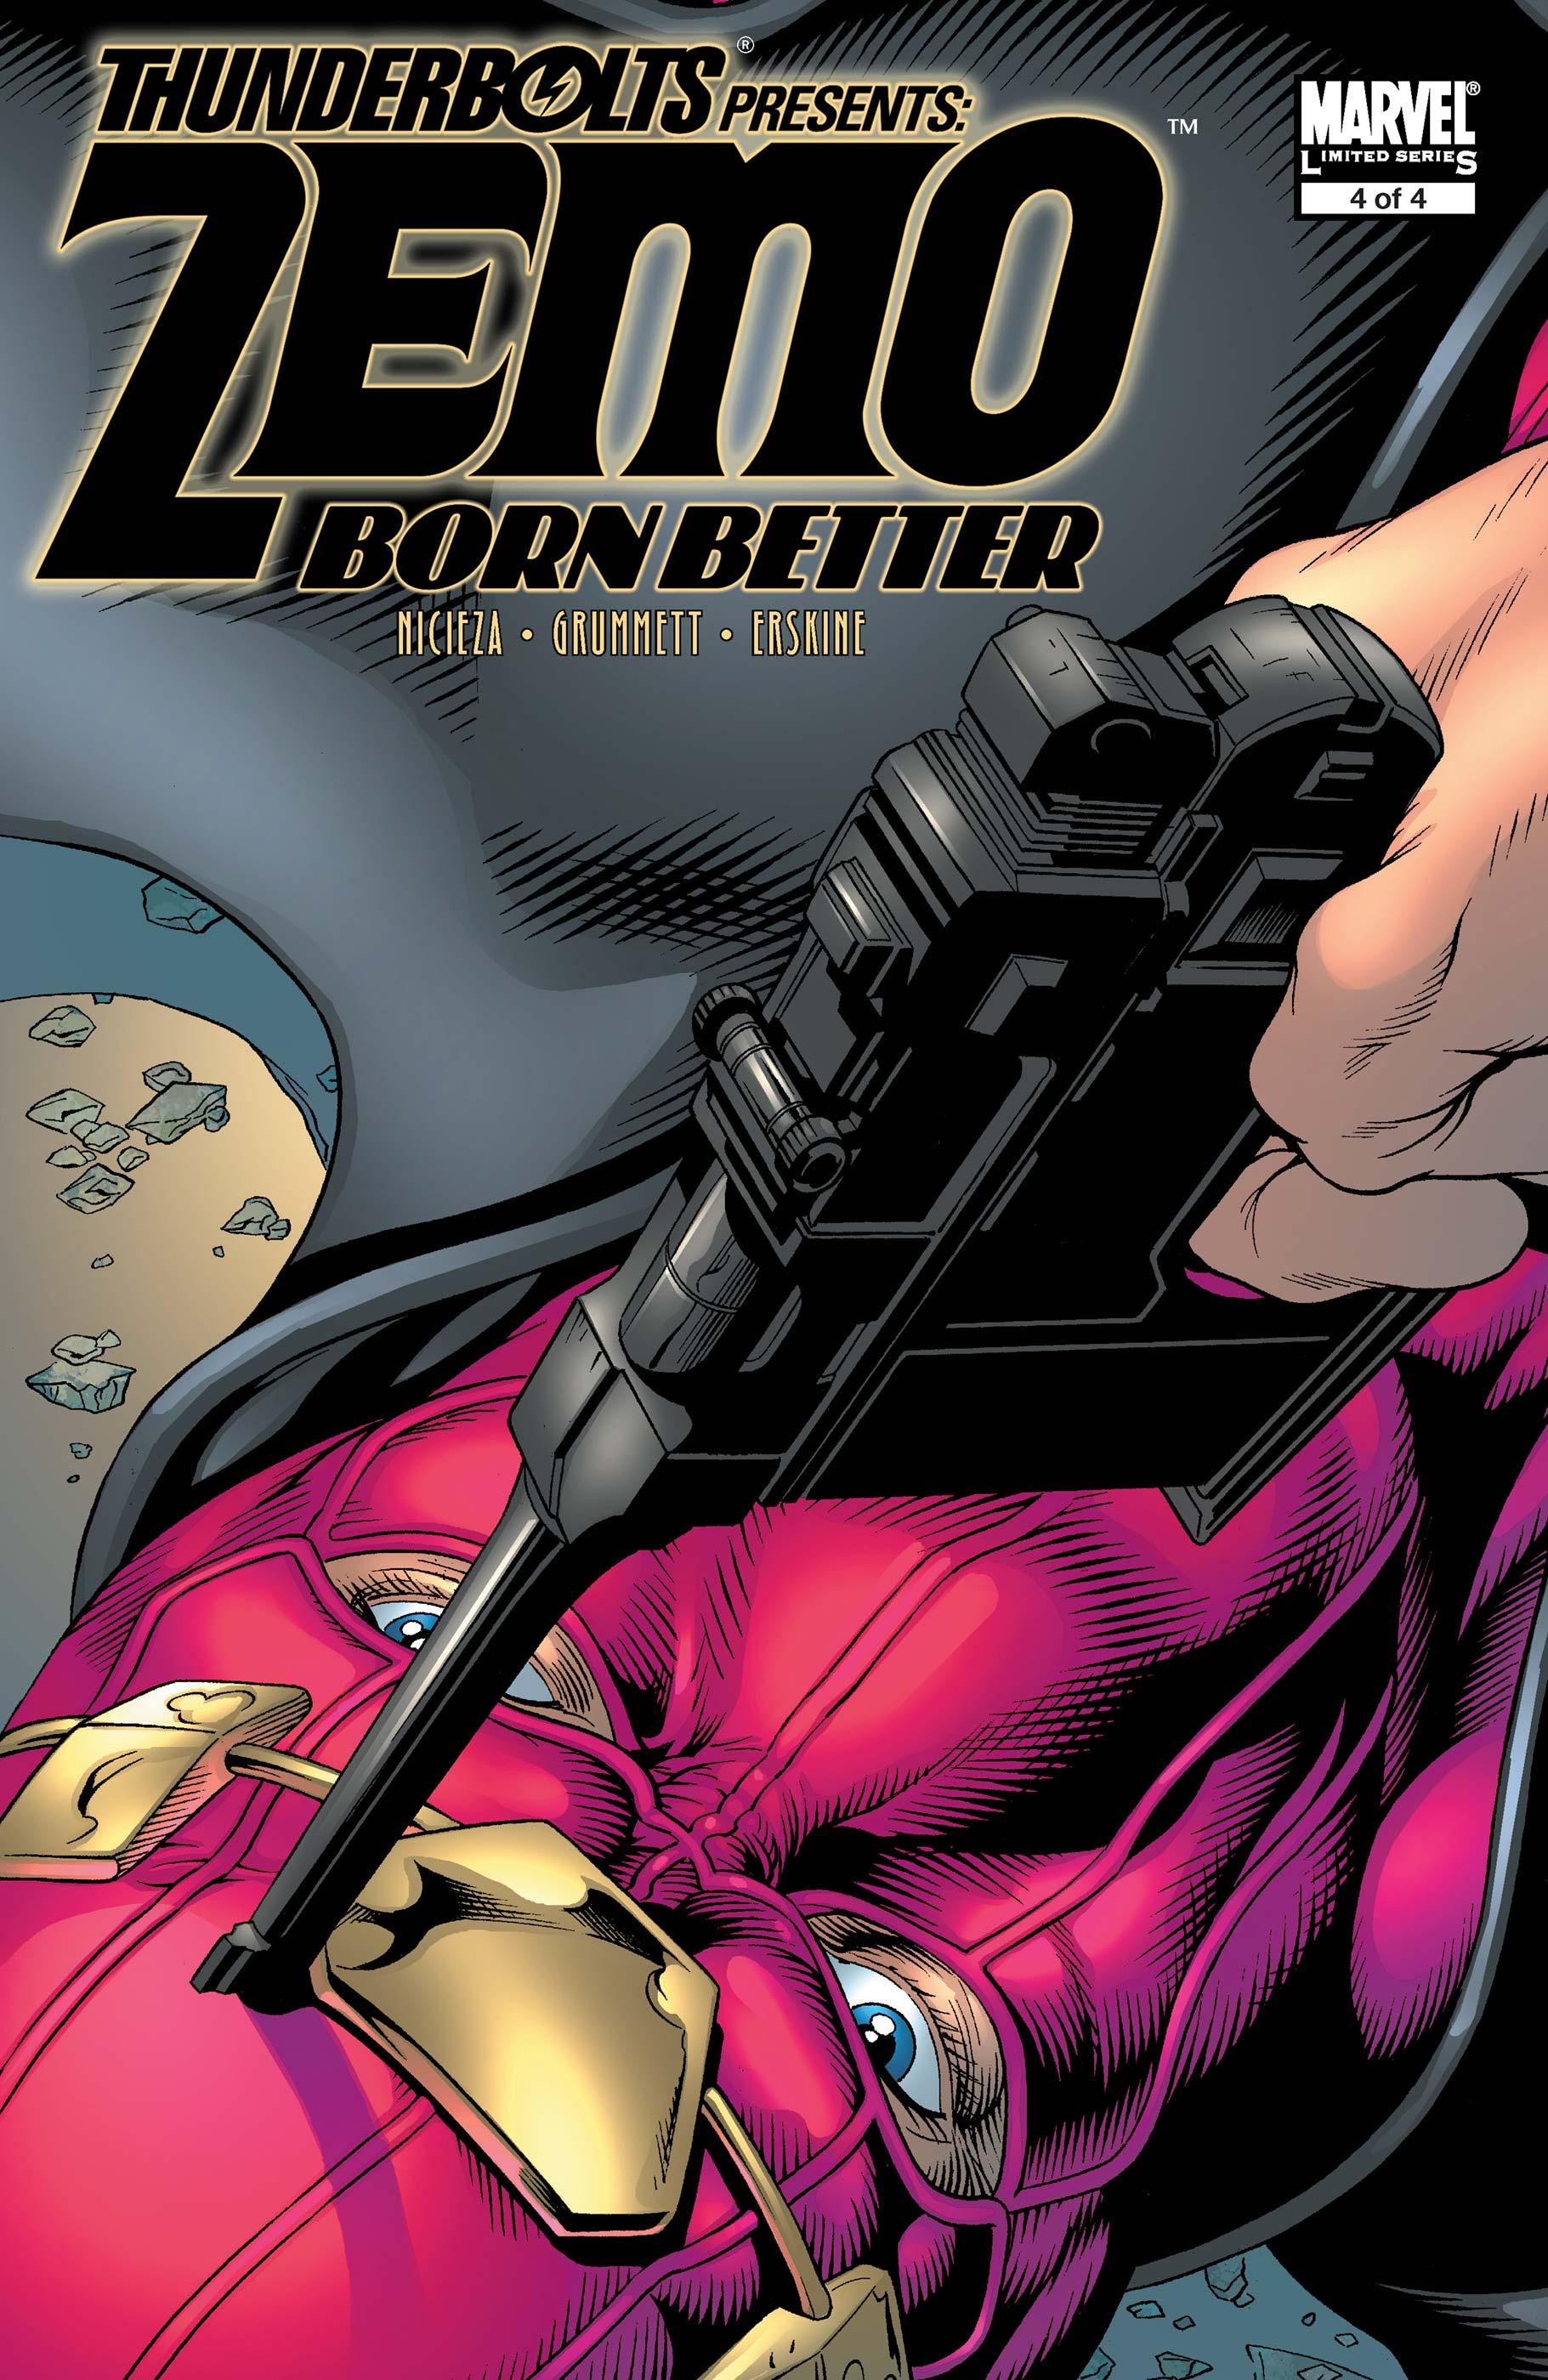 Thunderbolts Presents: Zemo - Born Better (2007) #4